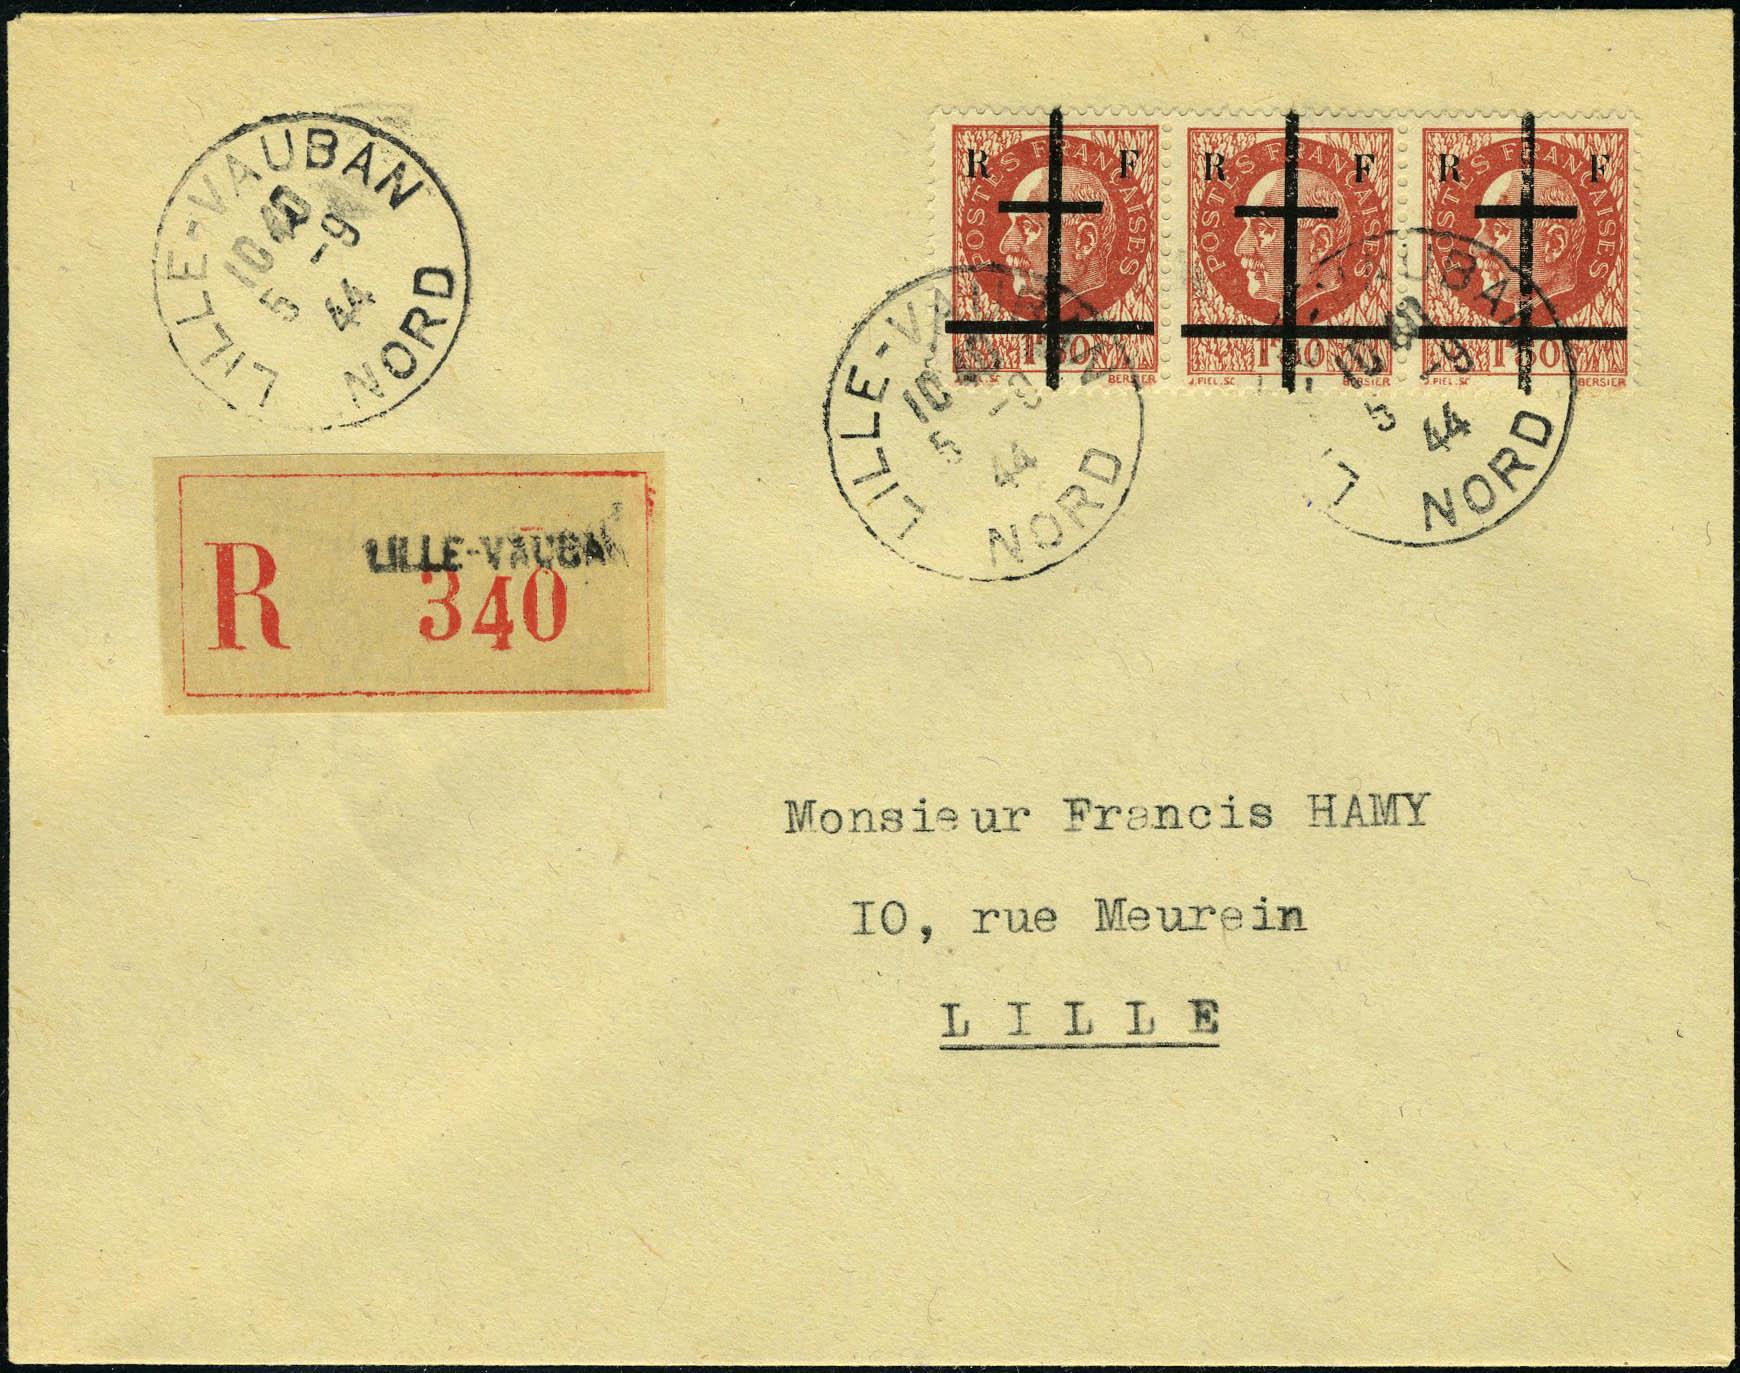 Lot 1464 - France timbres de liberation - cat. mayer -  Francois Feldman F.C.N.P François FELDMAN sale #124